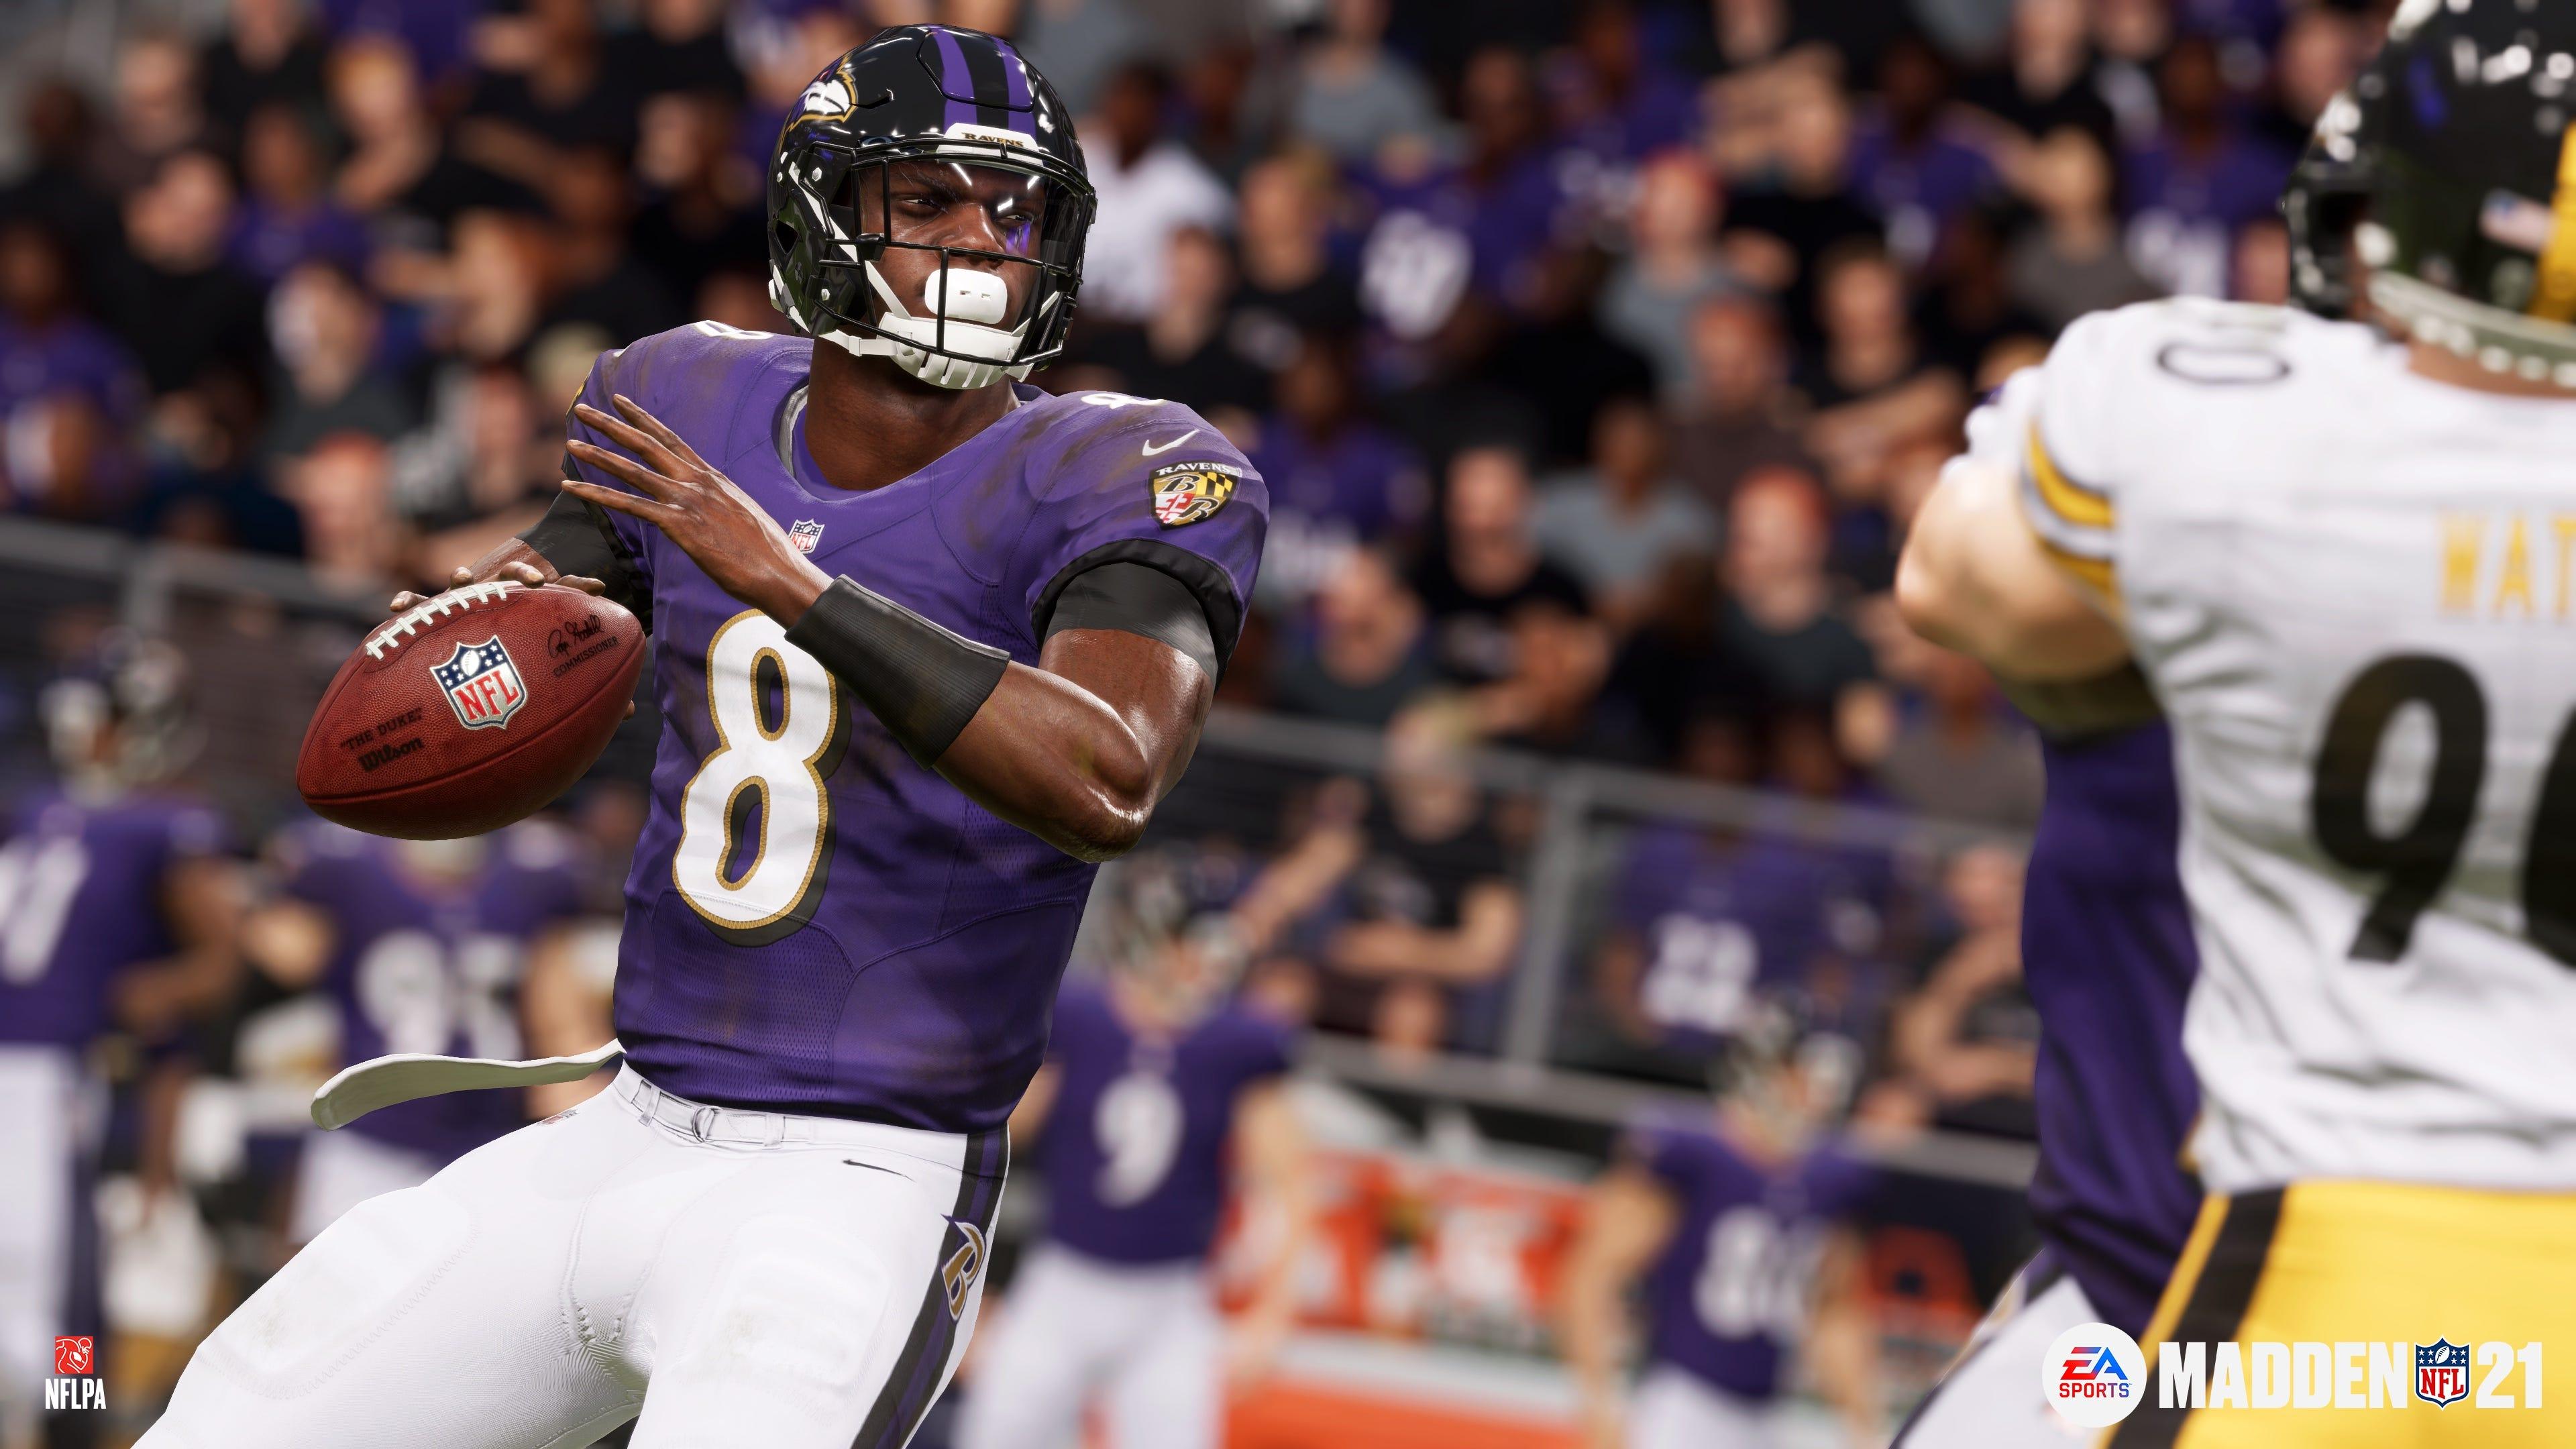 'Madden NFL 21': Update for